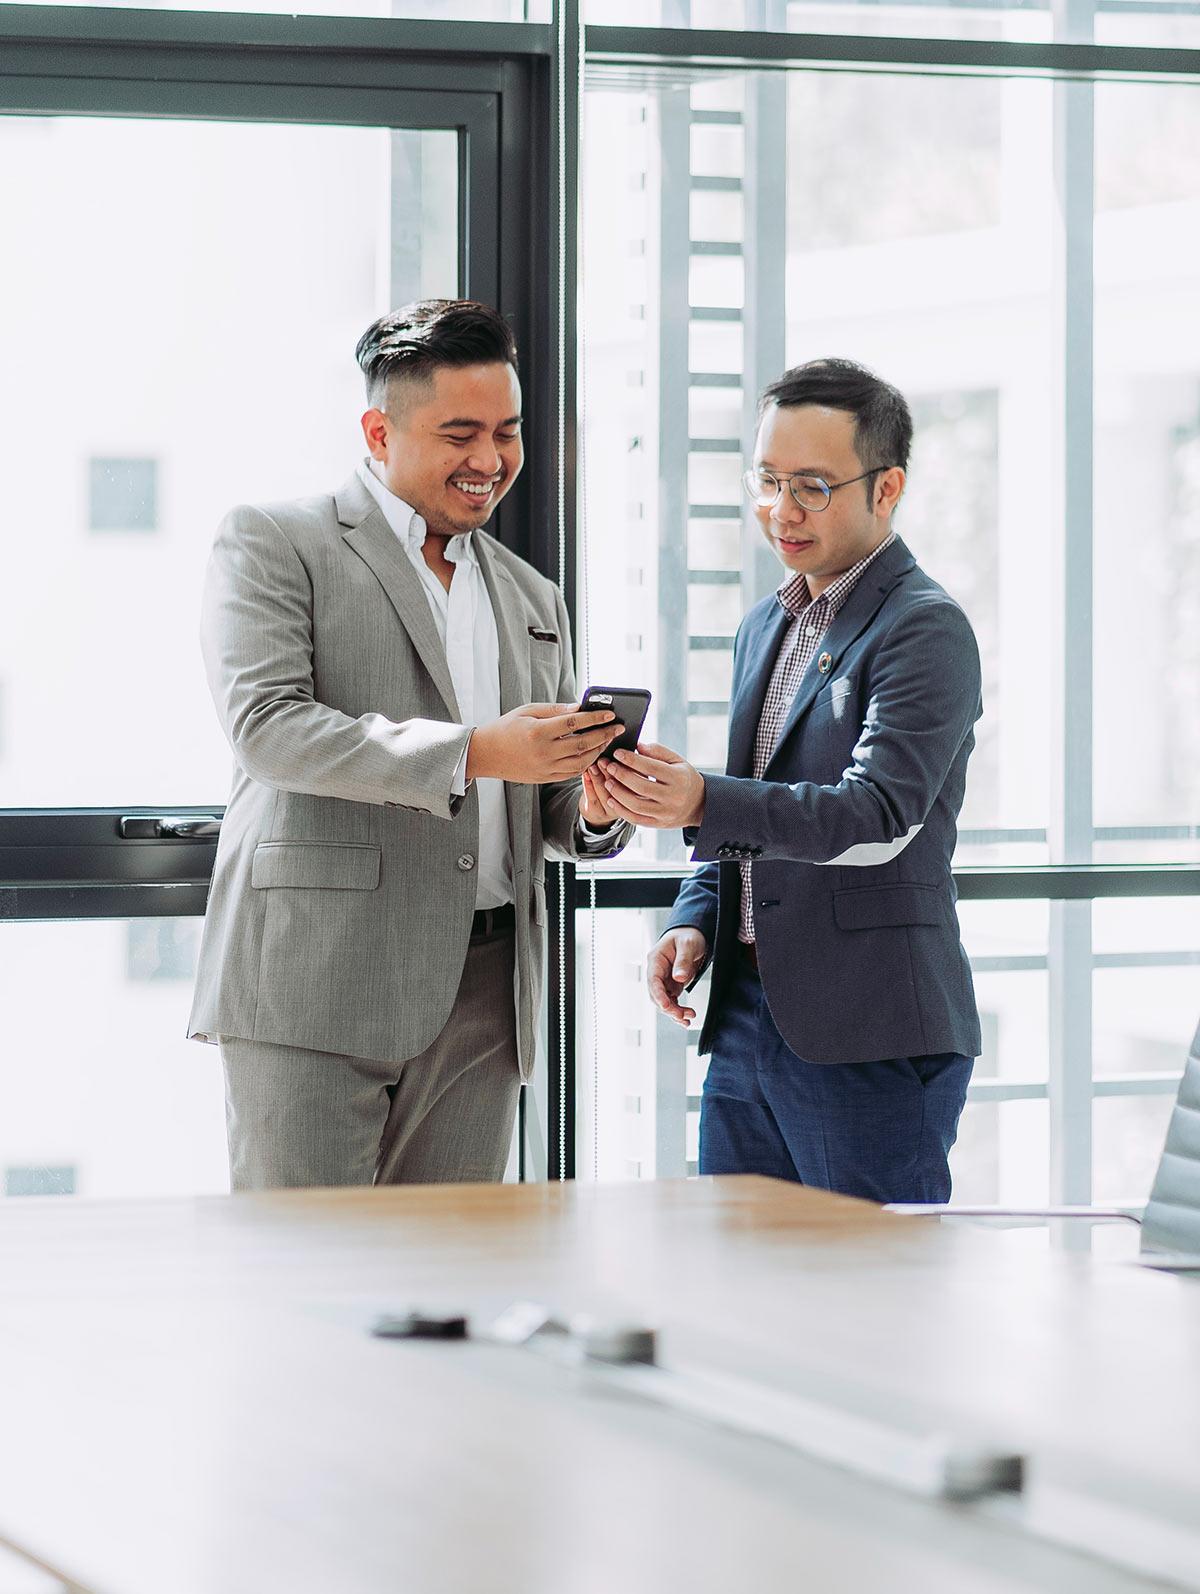 2 business men in a boardroom